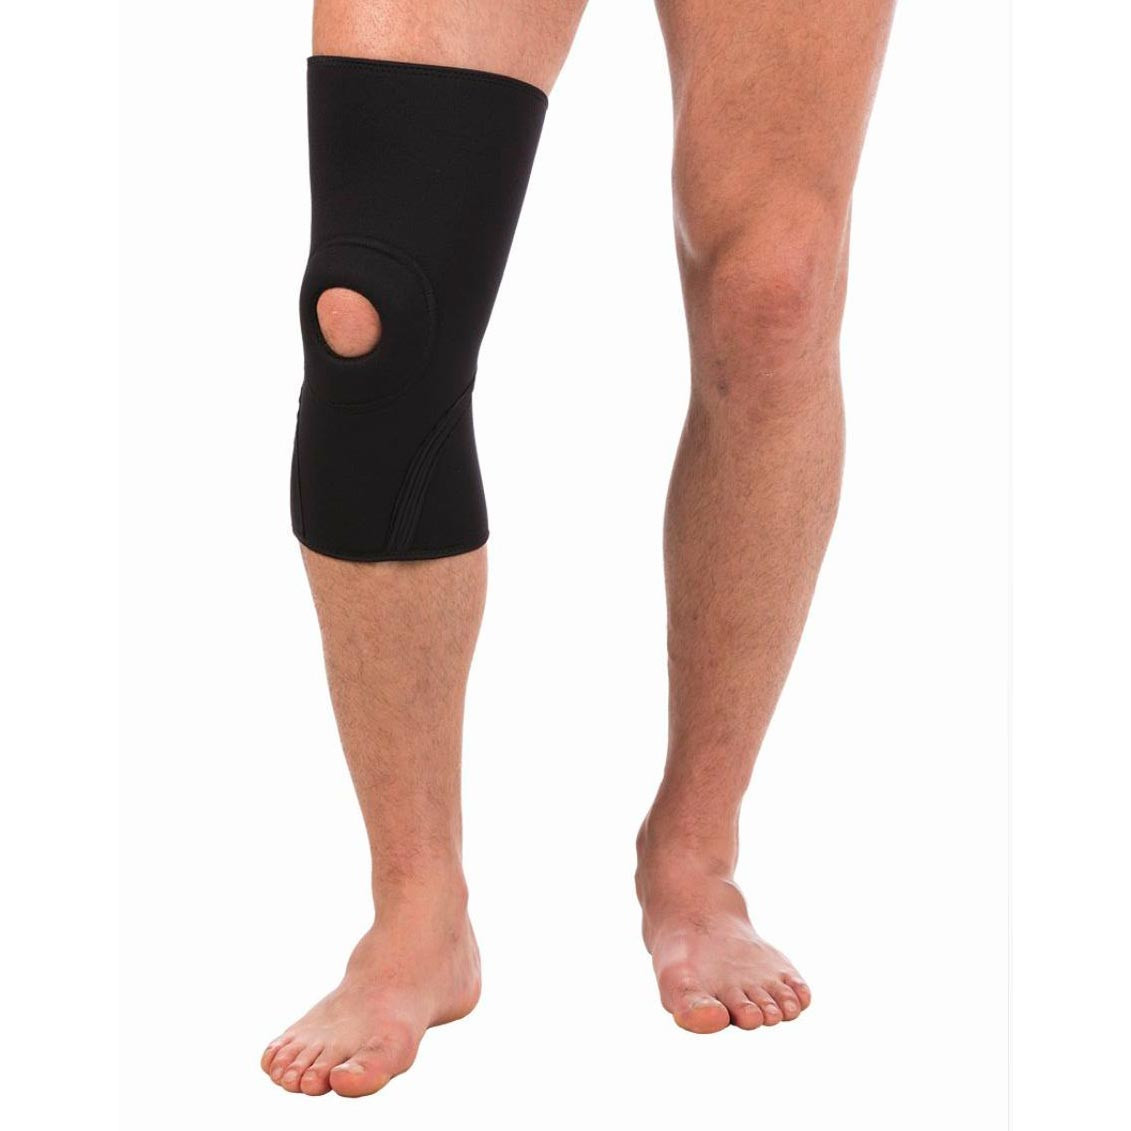 Бандаж на коленный сустав Тривес Т-8507. Медтехника72. Тюмень.